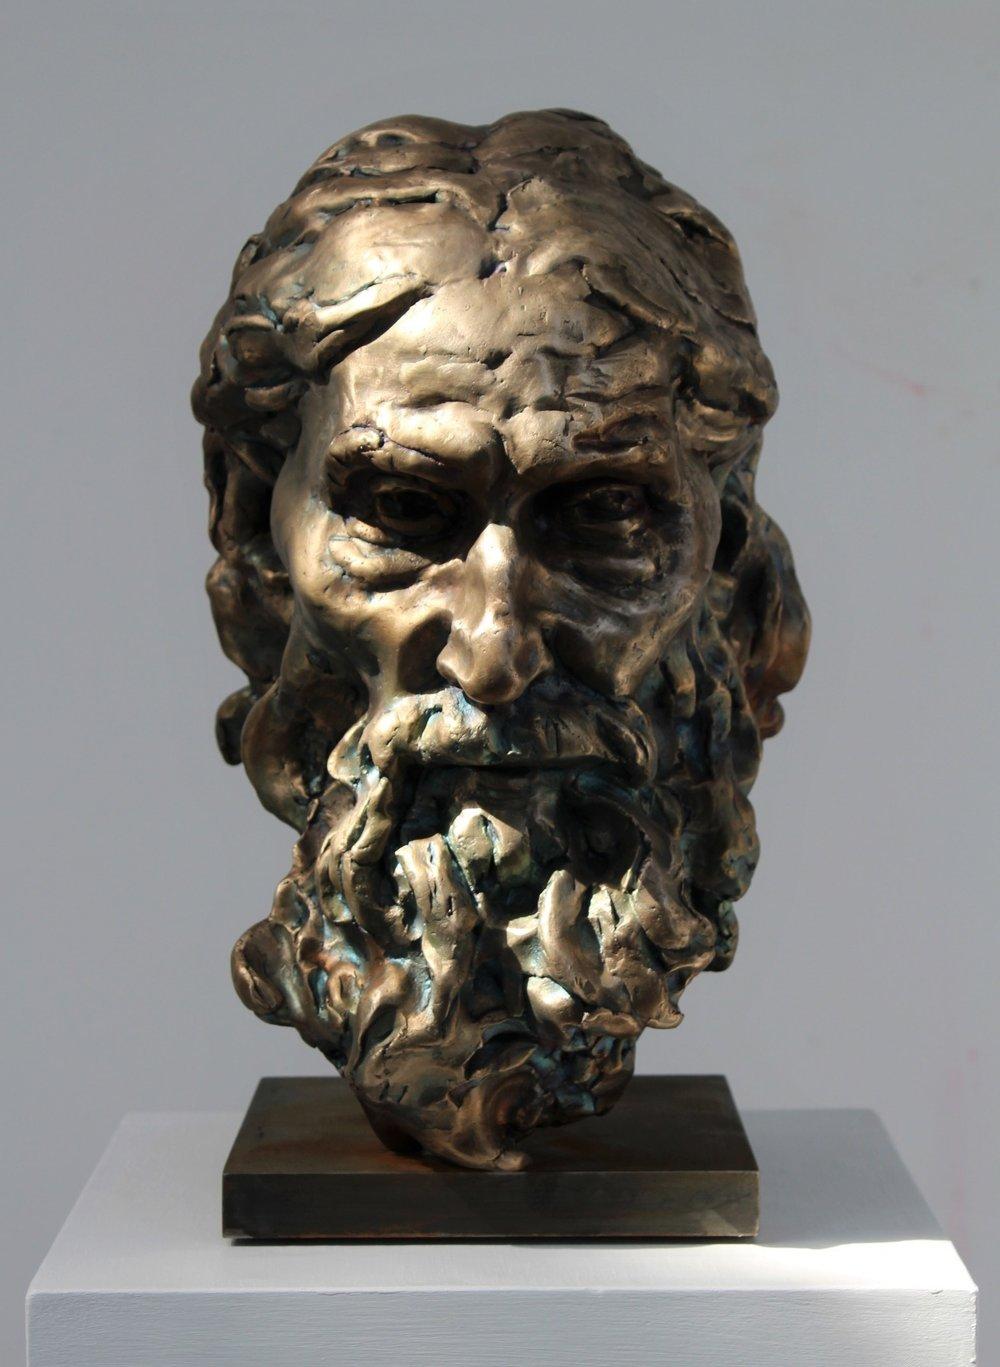 'After Rodin', bronze, 2014